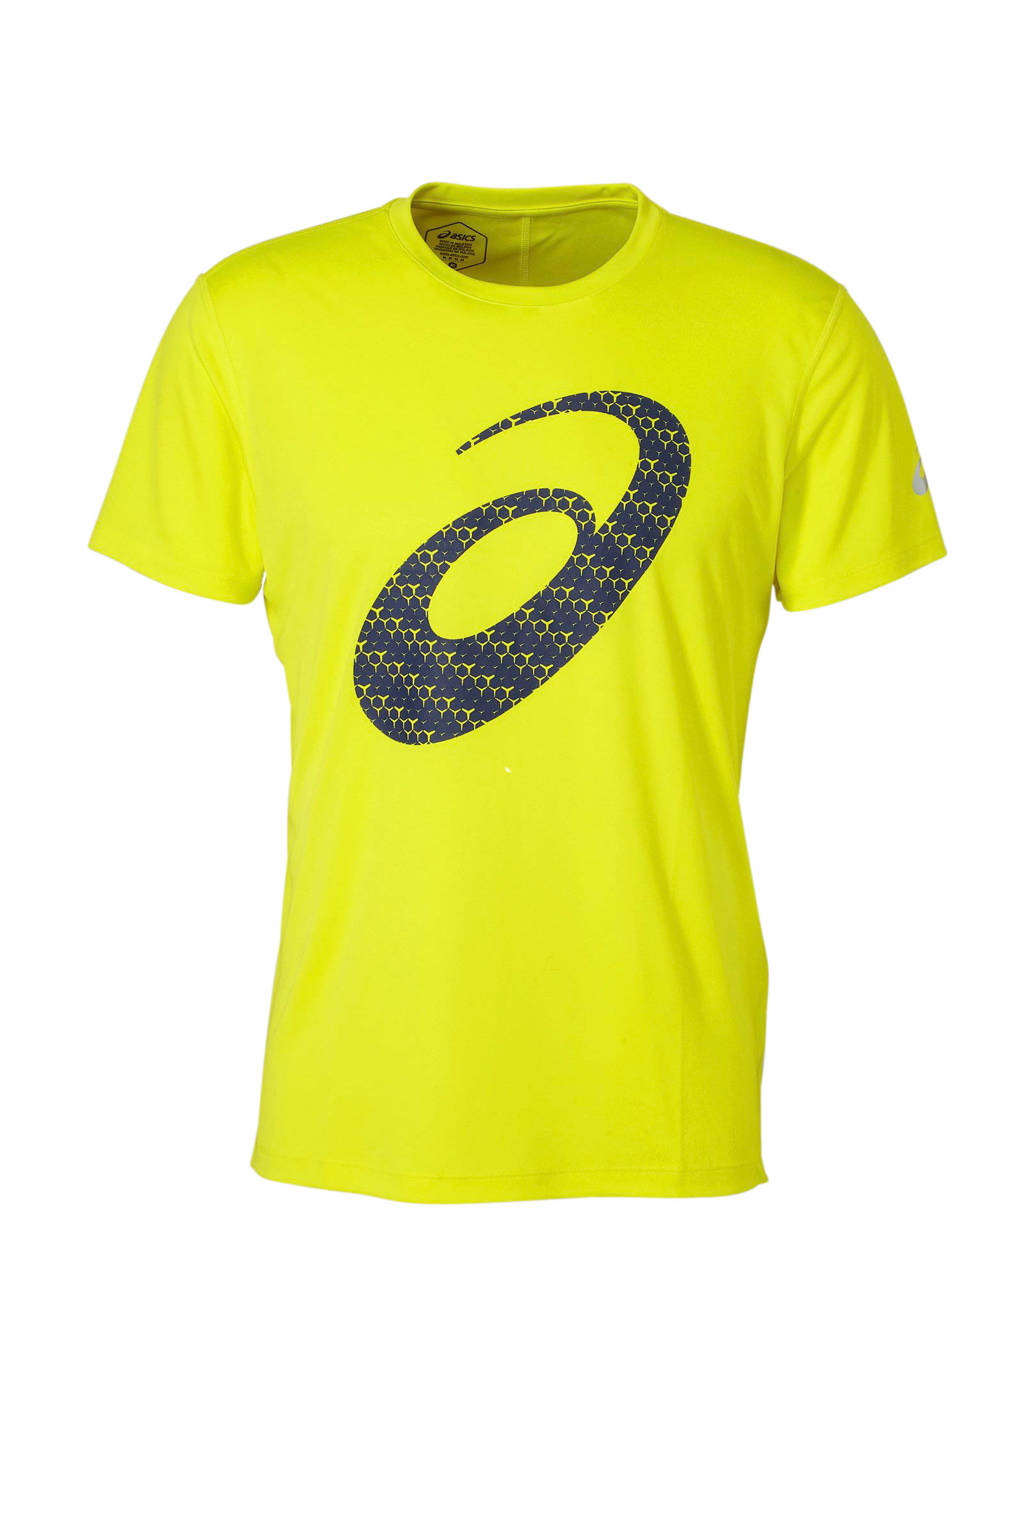 ASICS   hardloop T-shirt geel, Geel